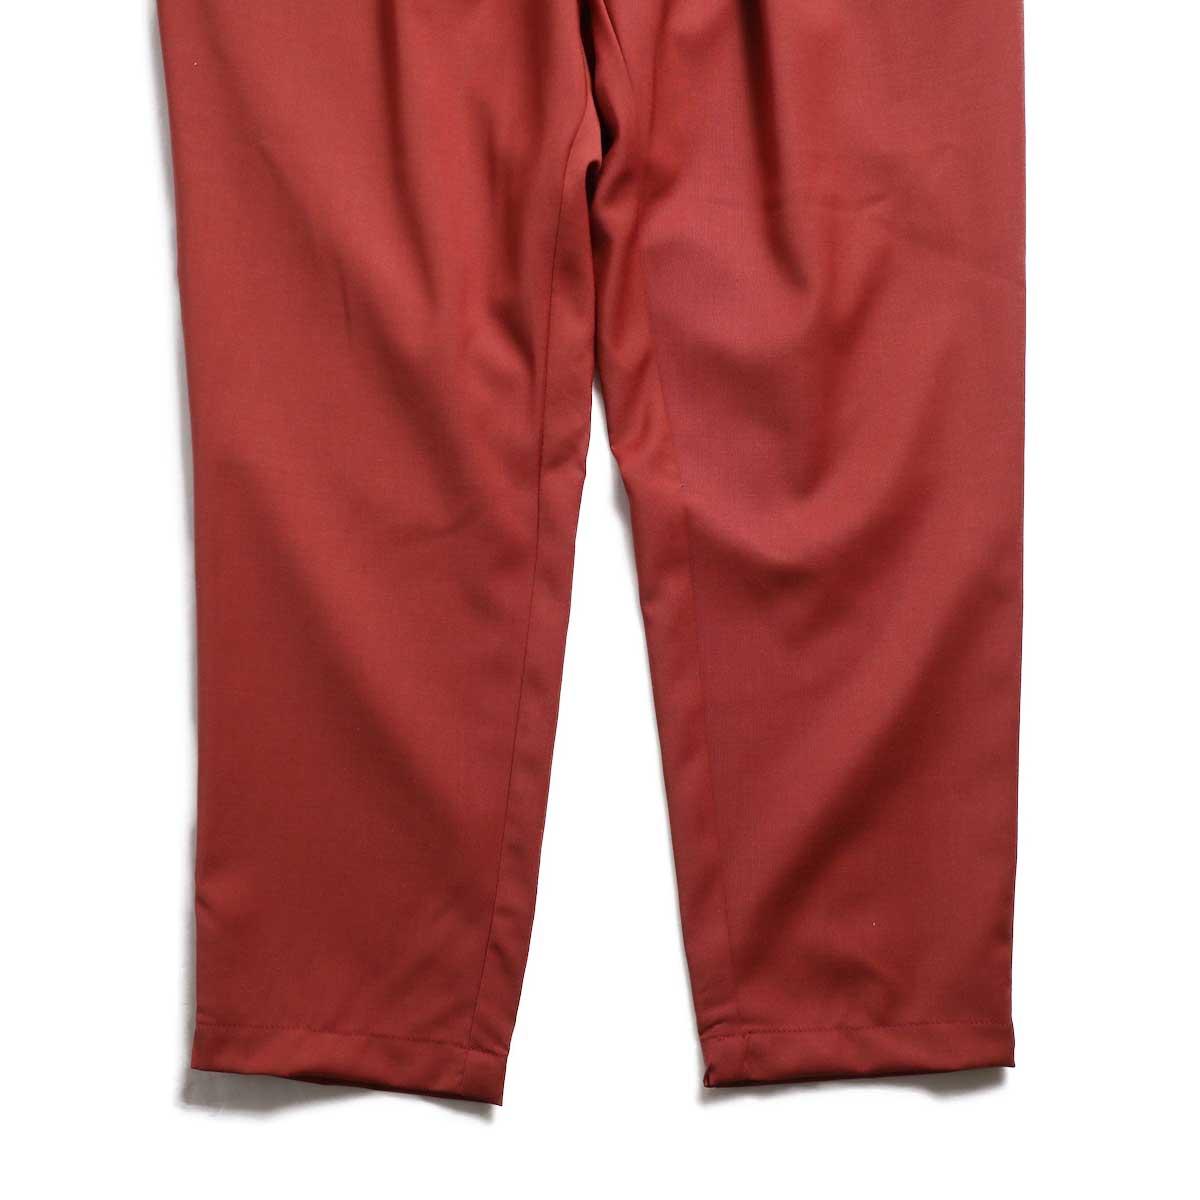 BASISBROEK / BRAVO Cropped Easy Pants (Sienna) 裾